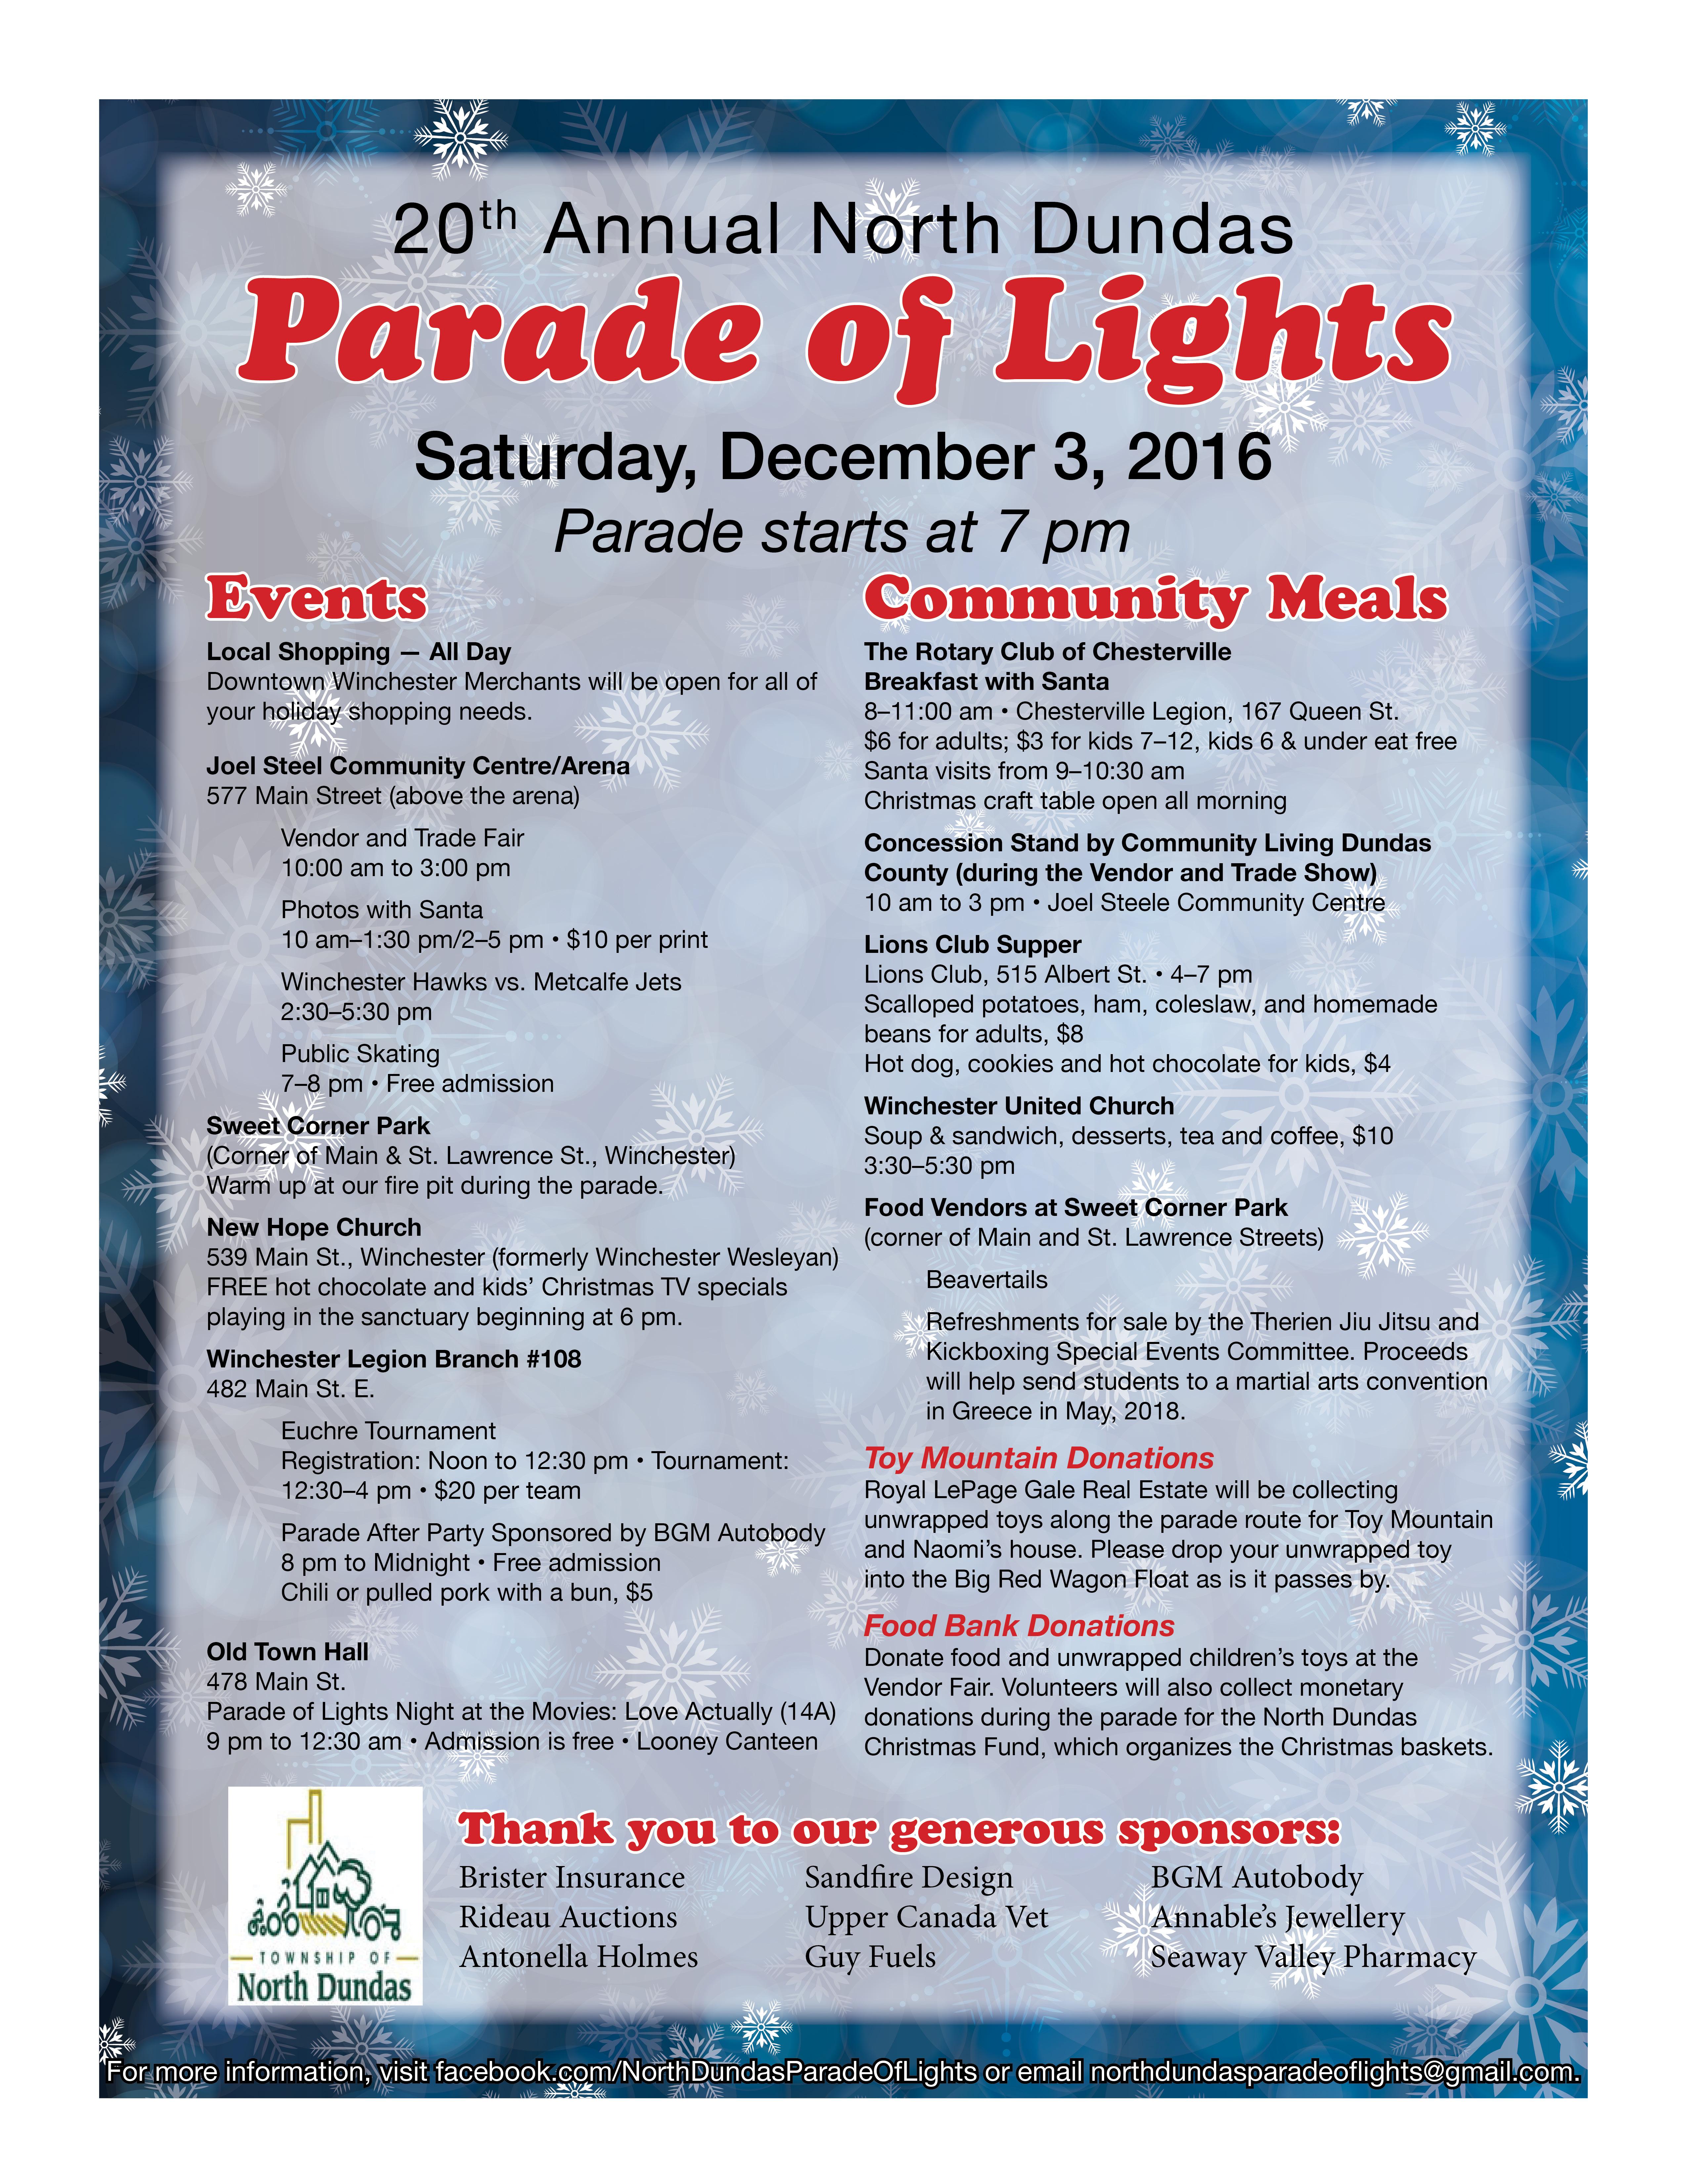 North Dundas Parade of Lights Poster